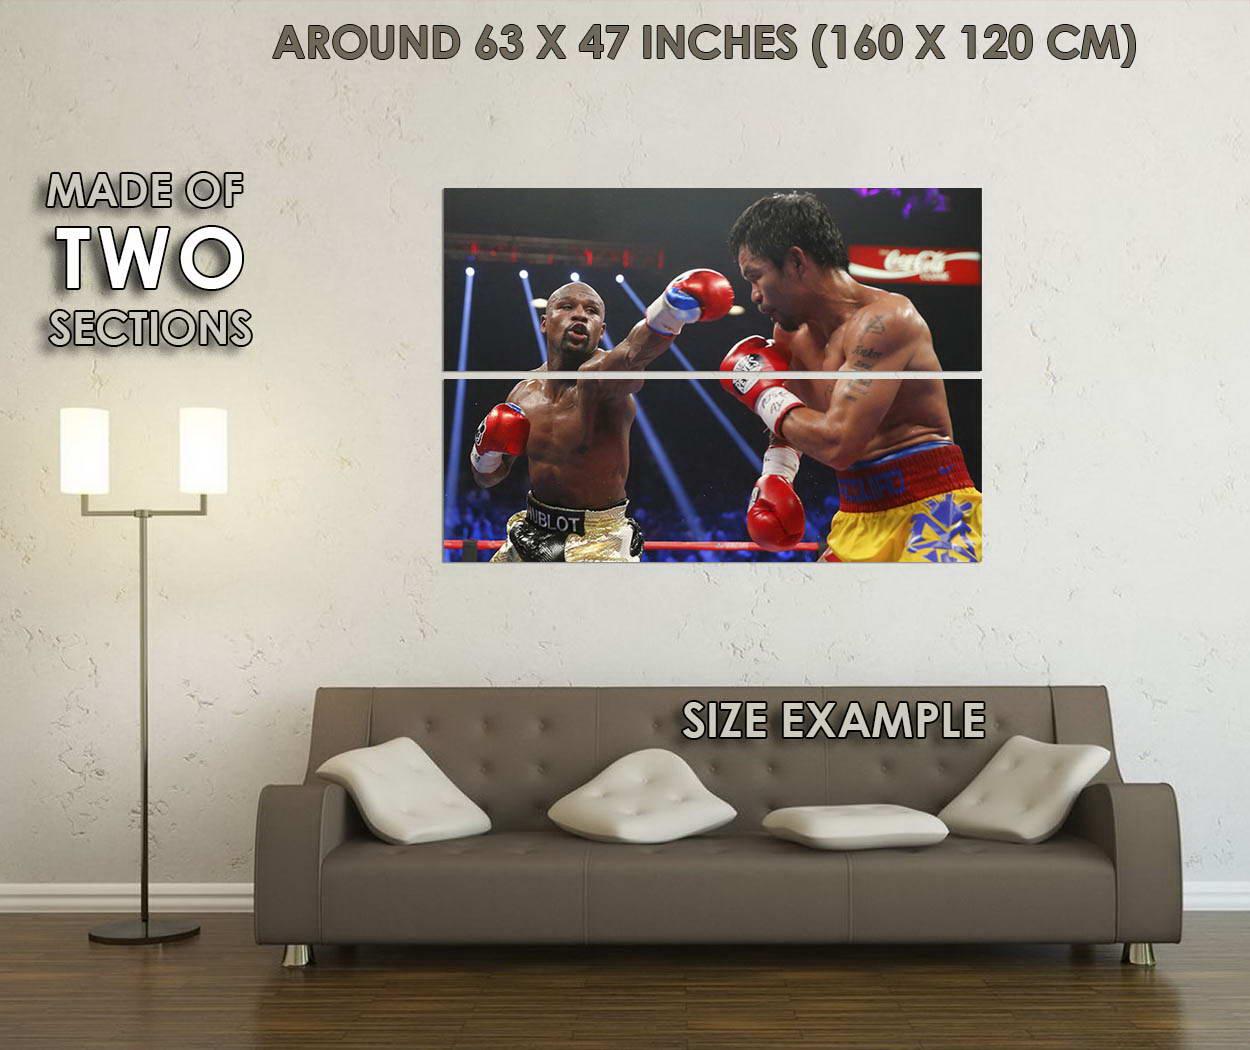 10501-Manny-Pacquiao-v-Floyd-Mayweather-Boxing-LAMINATED-POSTER-CA thumbnail 6